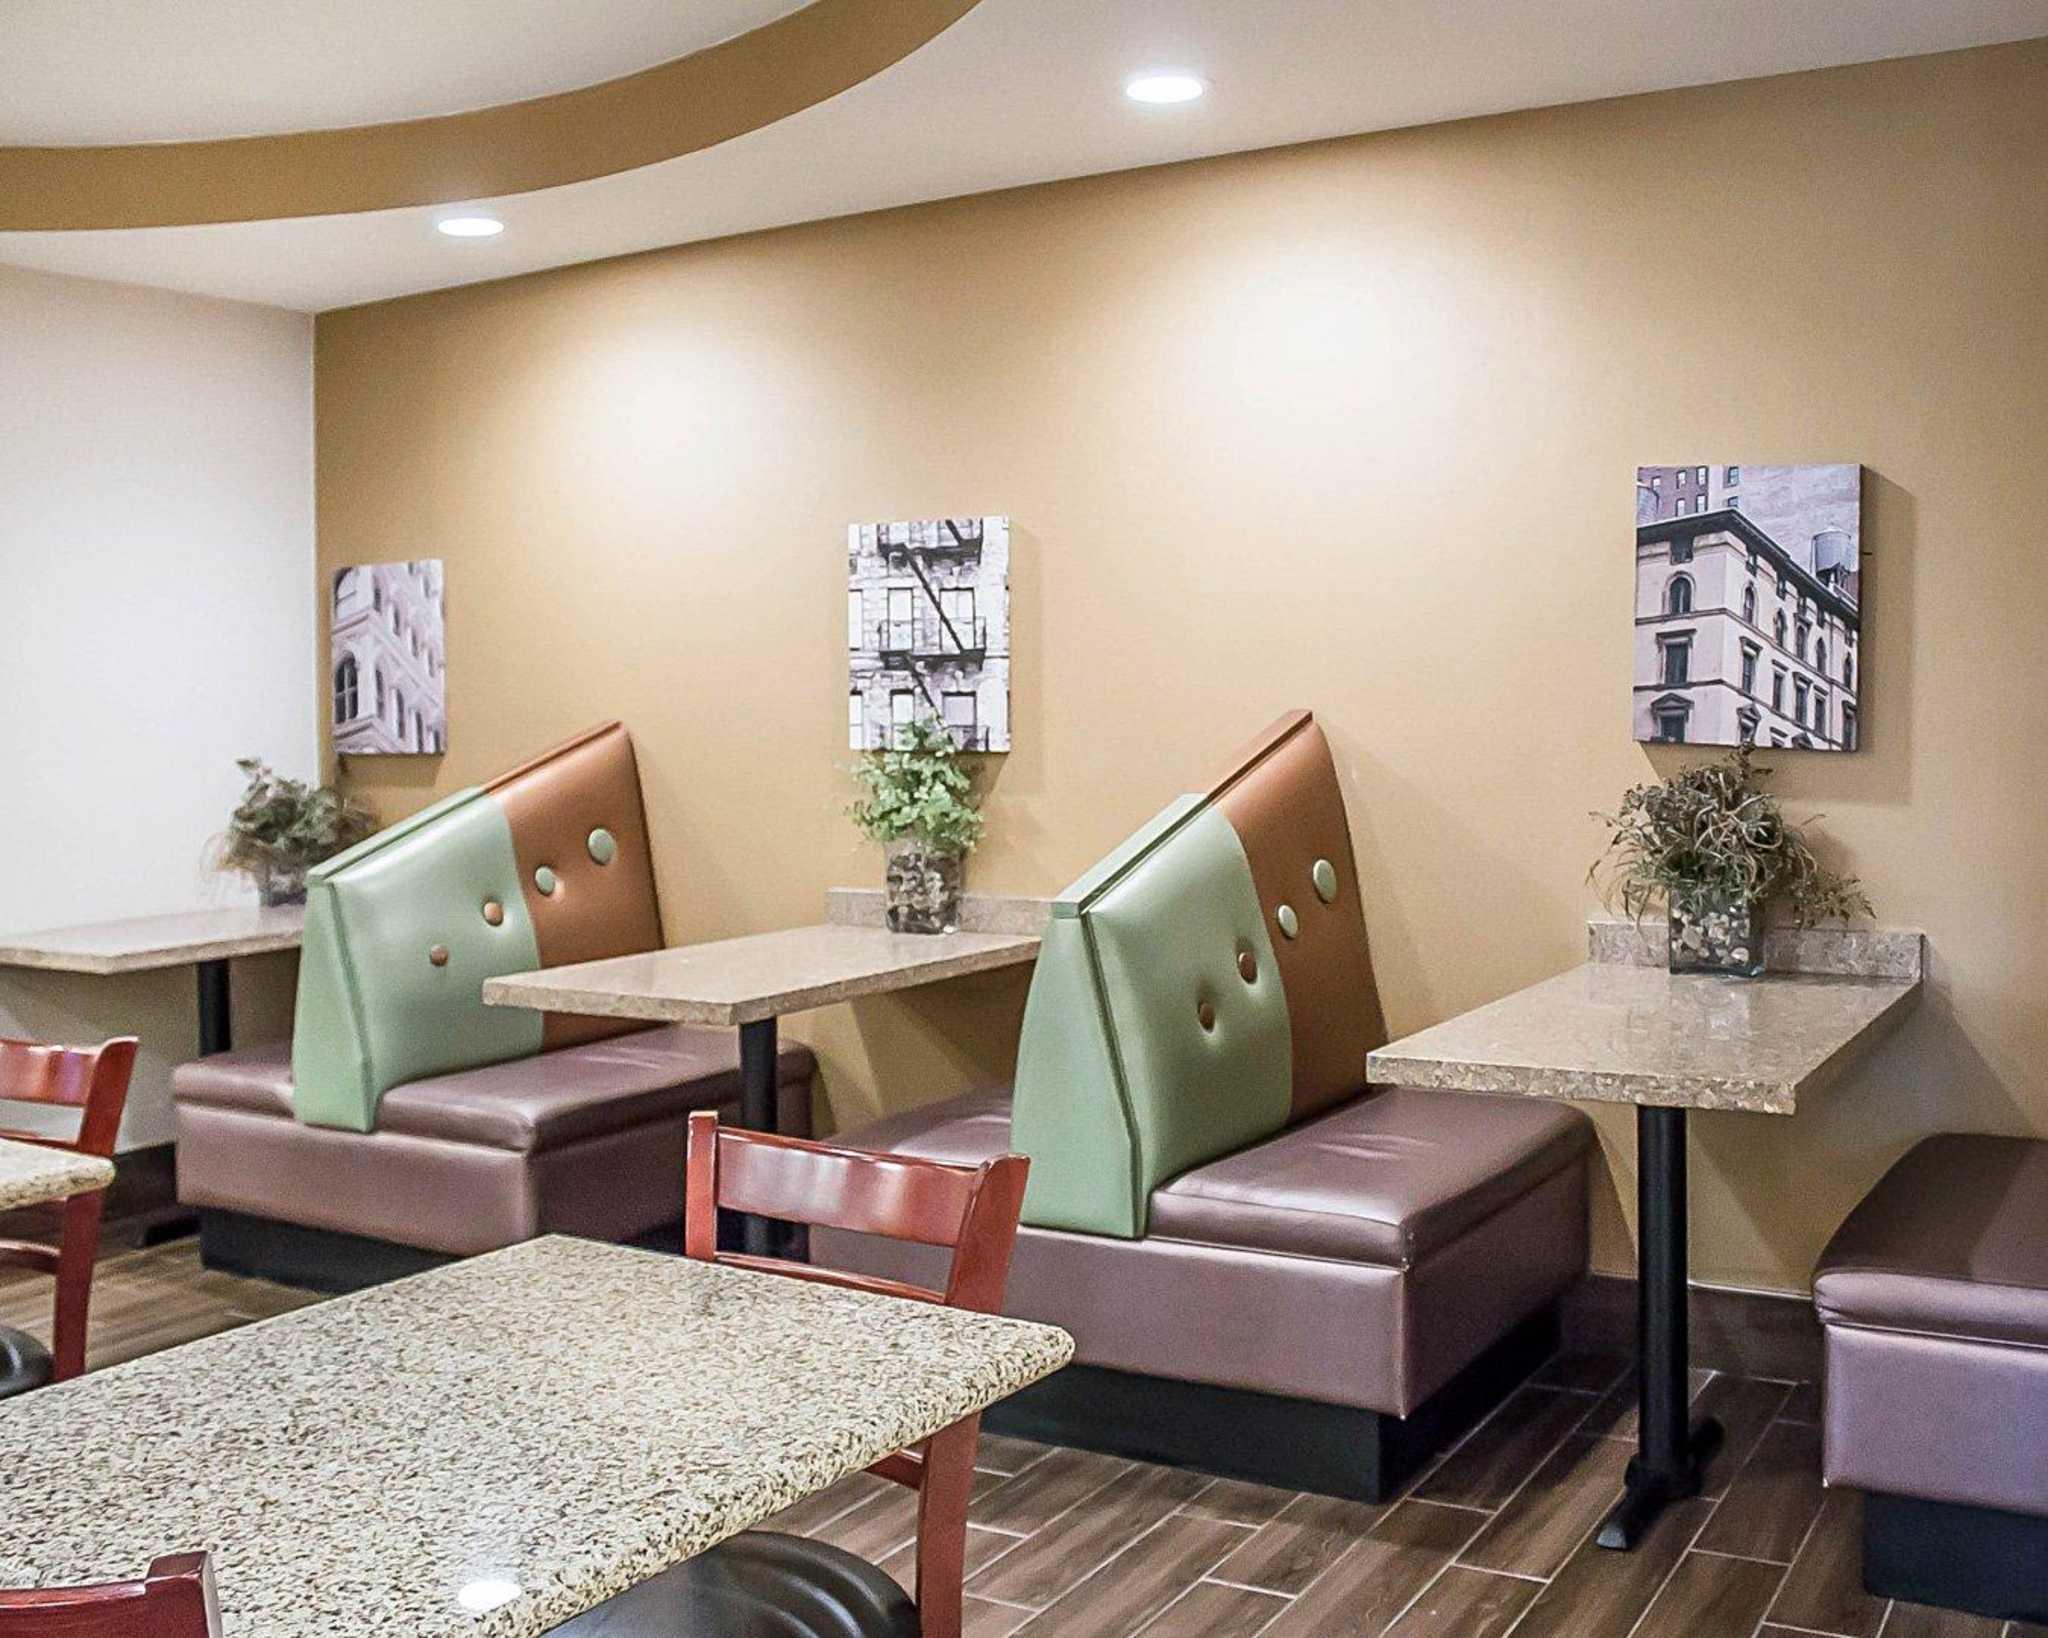 Comfort Suites Perrysburg - Toledo South image 15